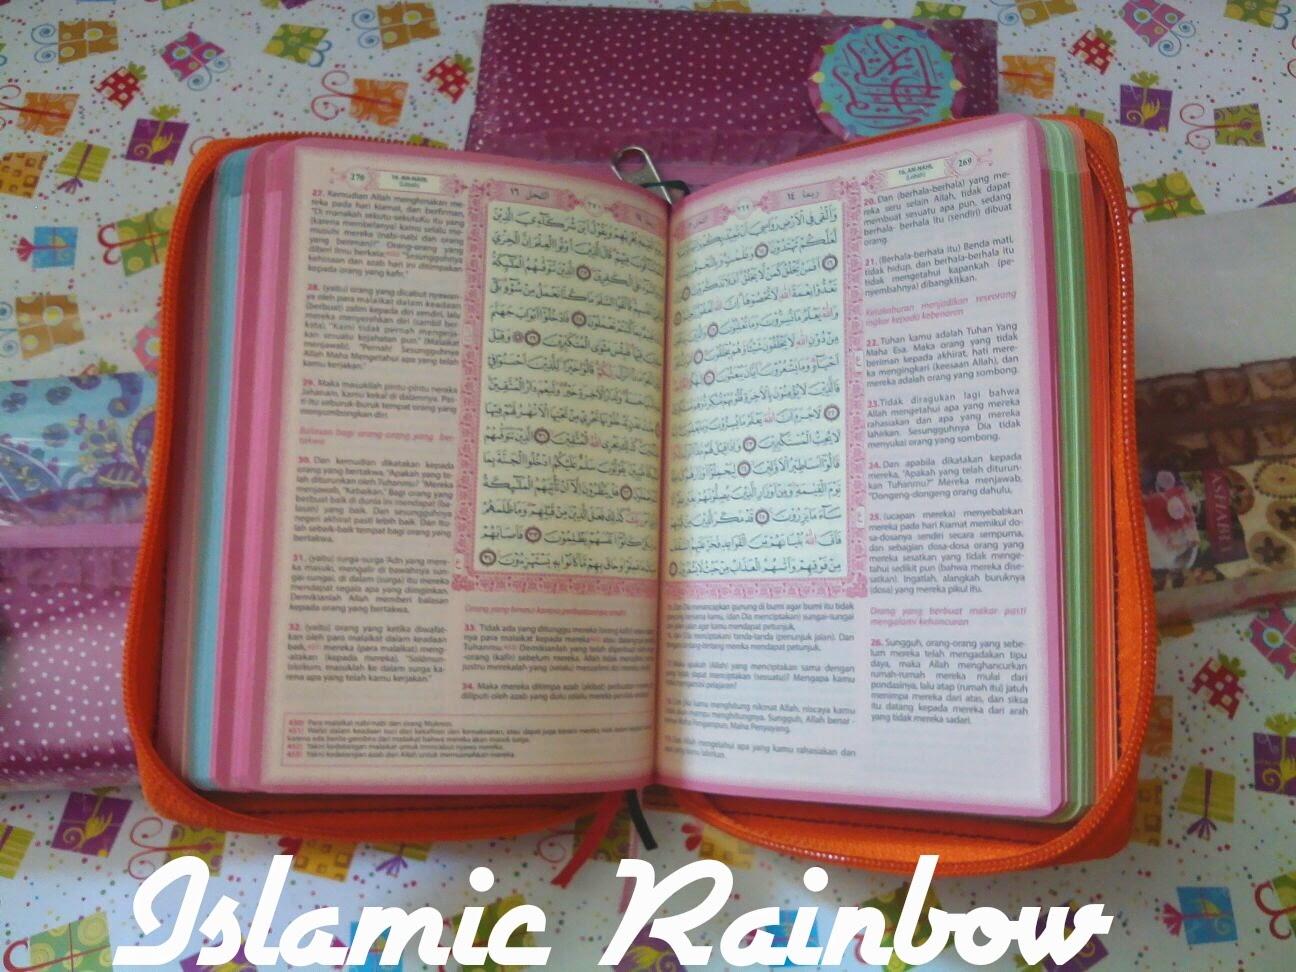 tampak dalam al quran rainbow mushaf khadijah, tampilan dalam al quran mushaf khadijah